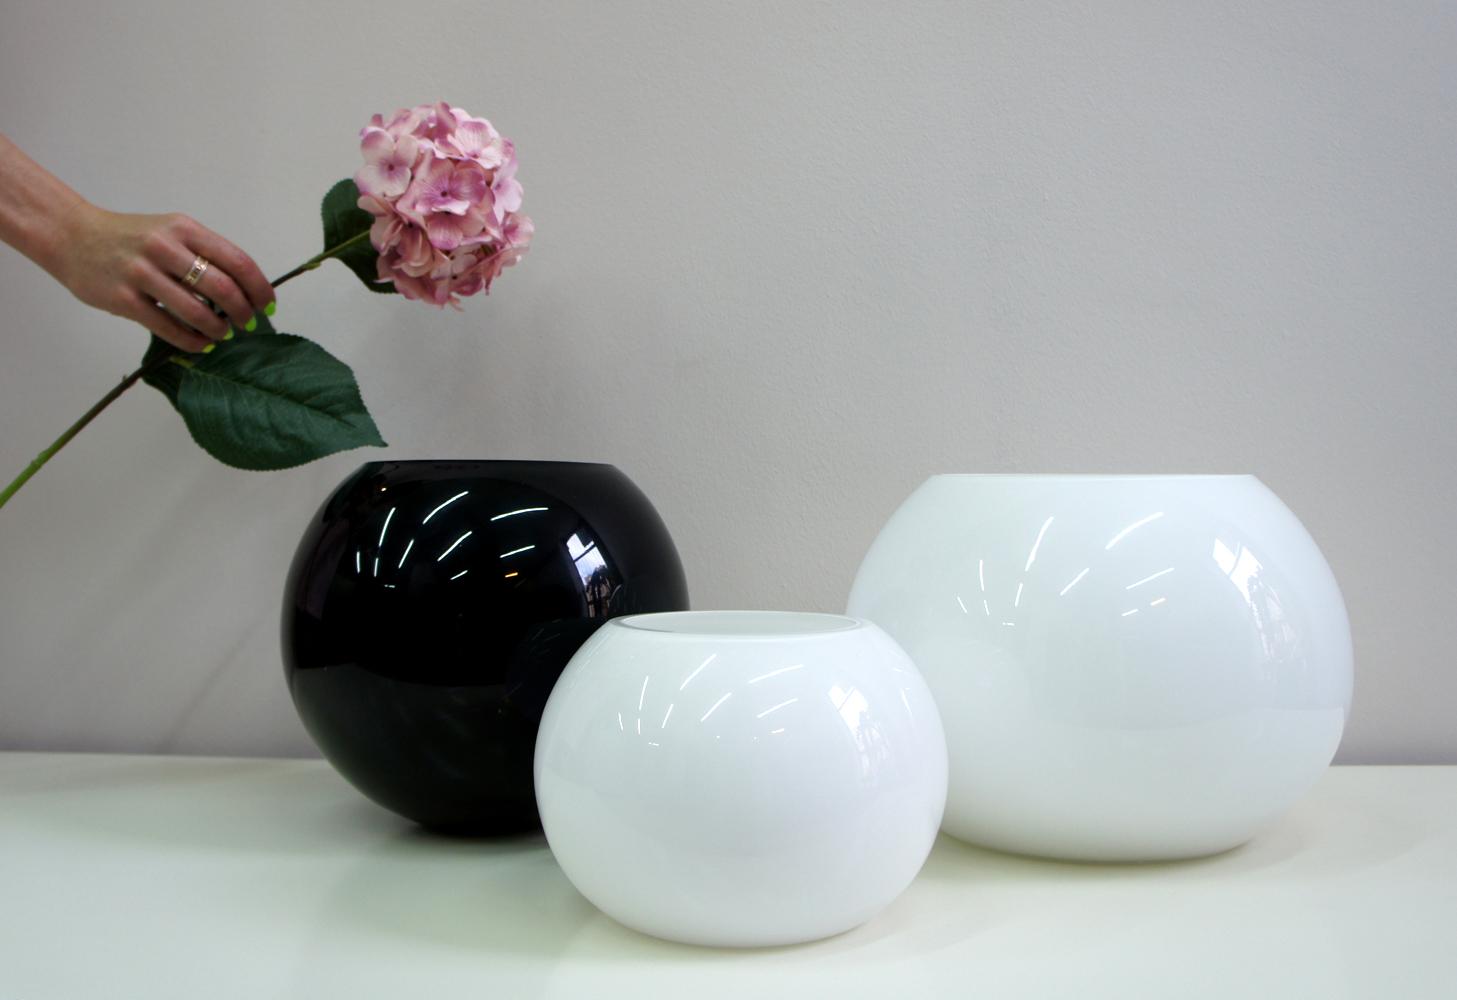 стеклянные вазы шары